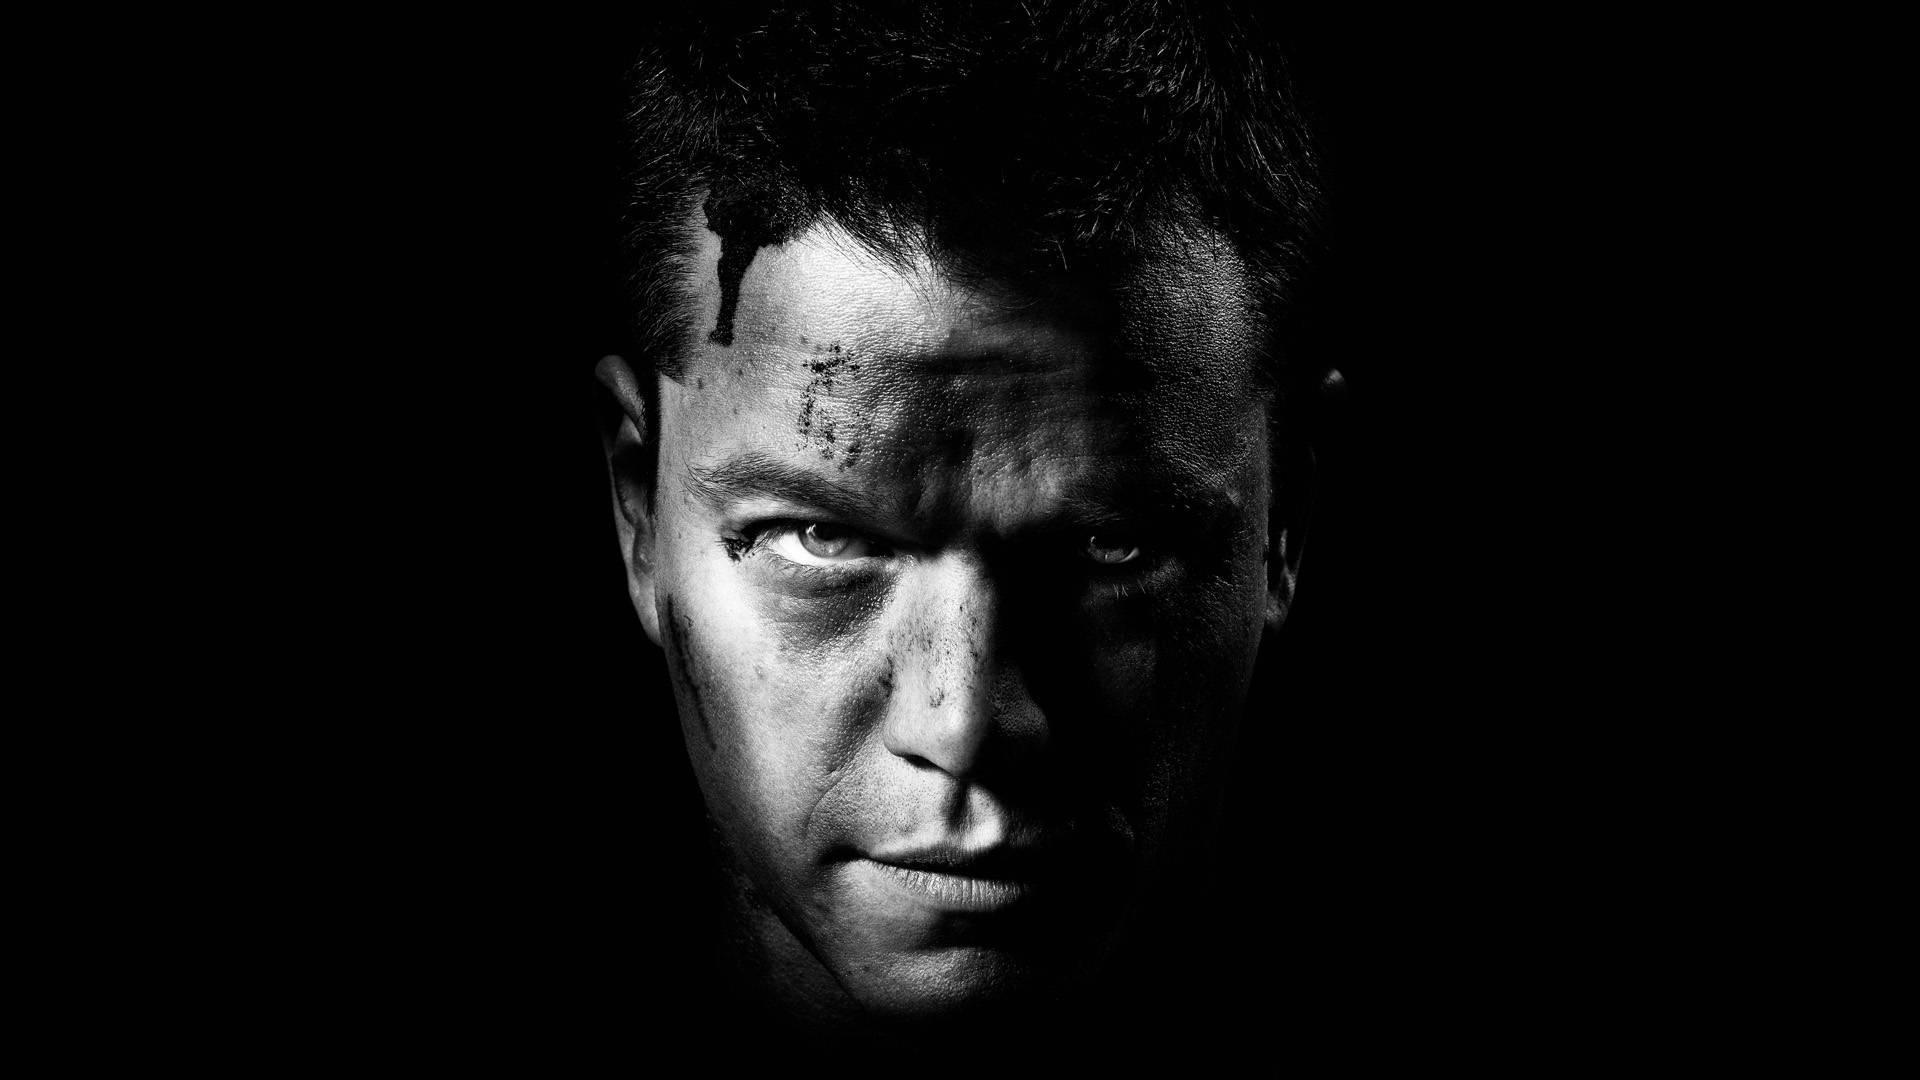 Matt Damon Wallpaper For Computer